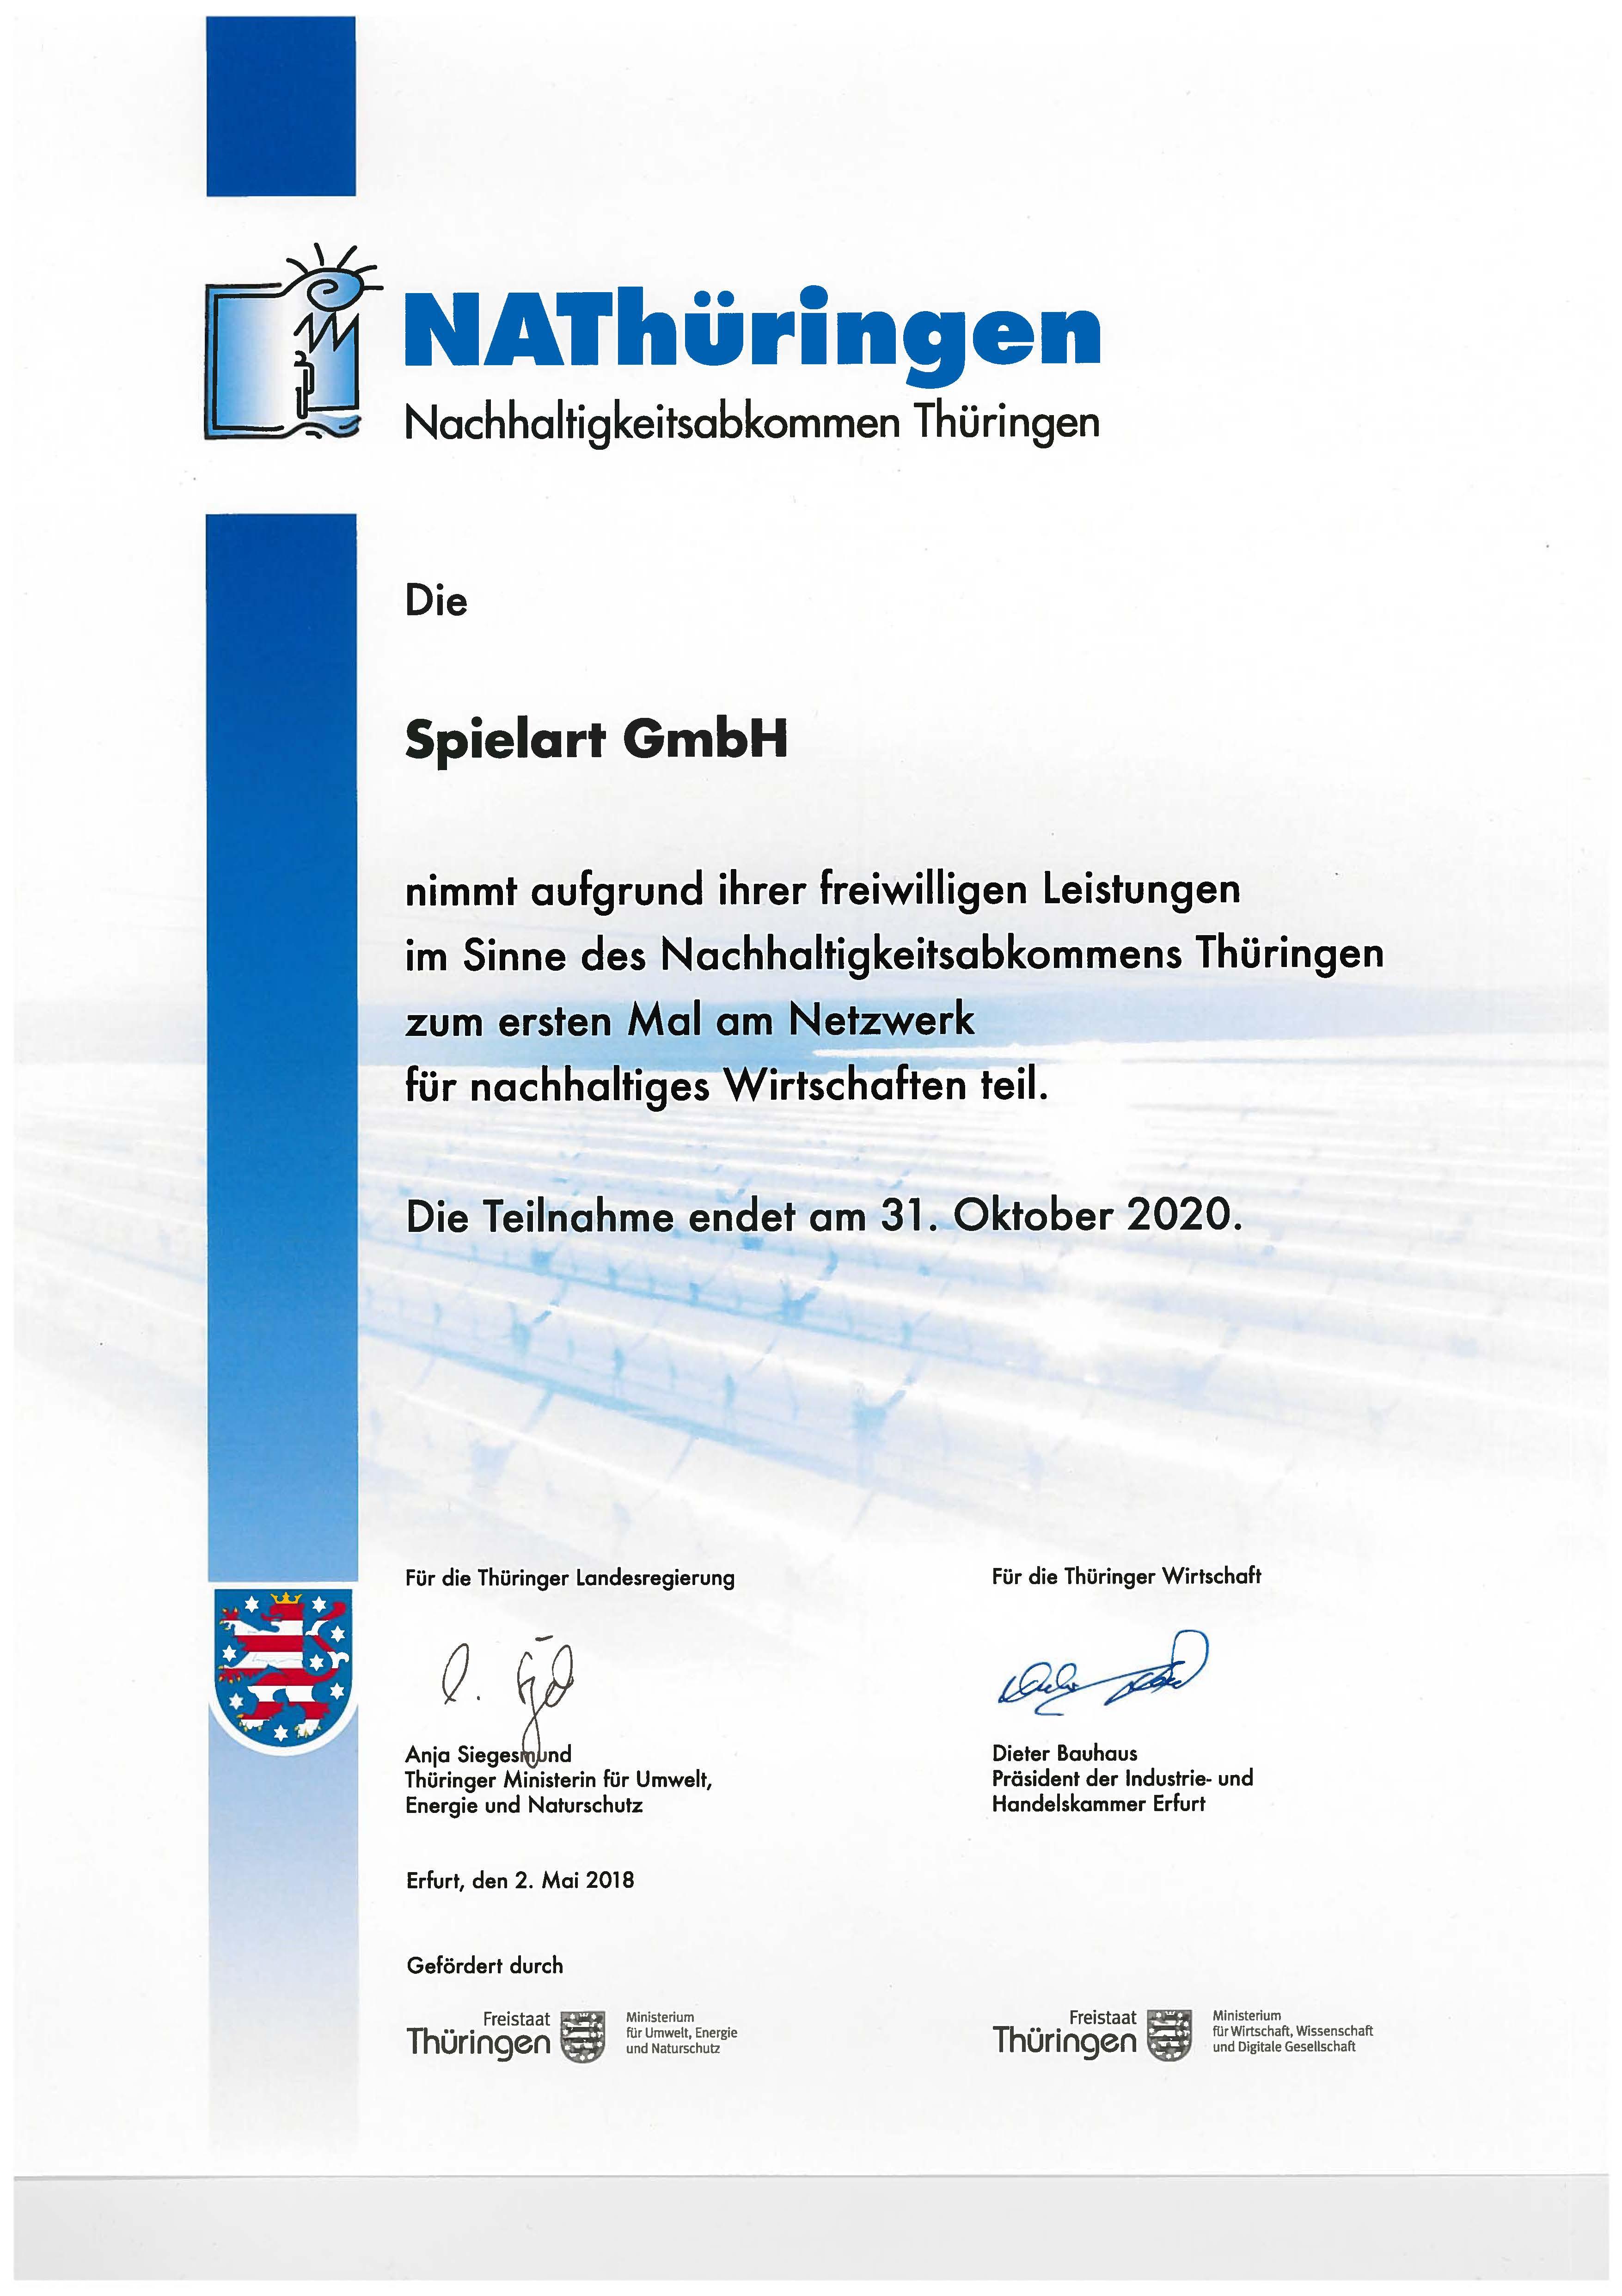 Nachhaltigkeit/CSR - Zertifikat Nachhaltigkeitsabkommen Thüringen